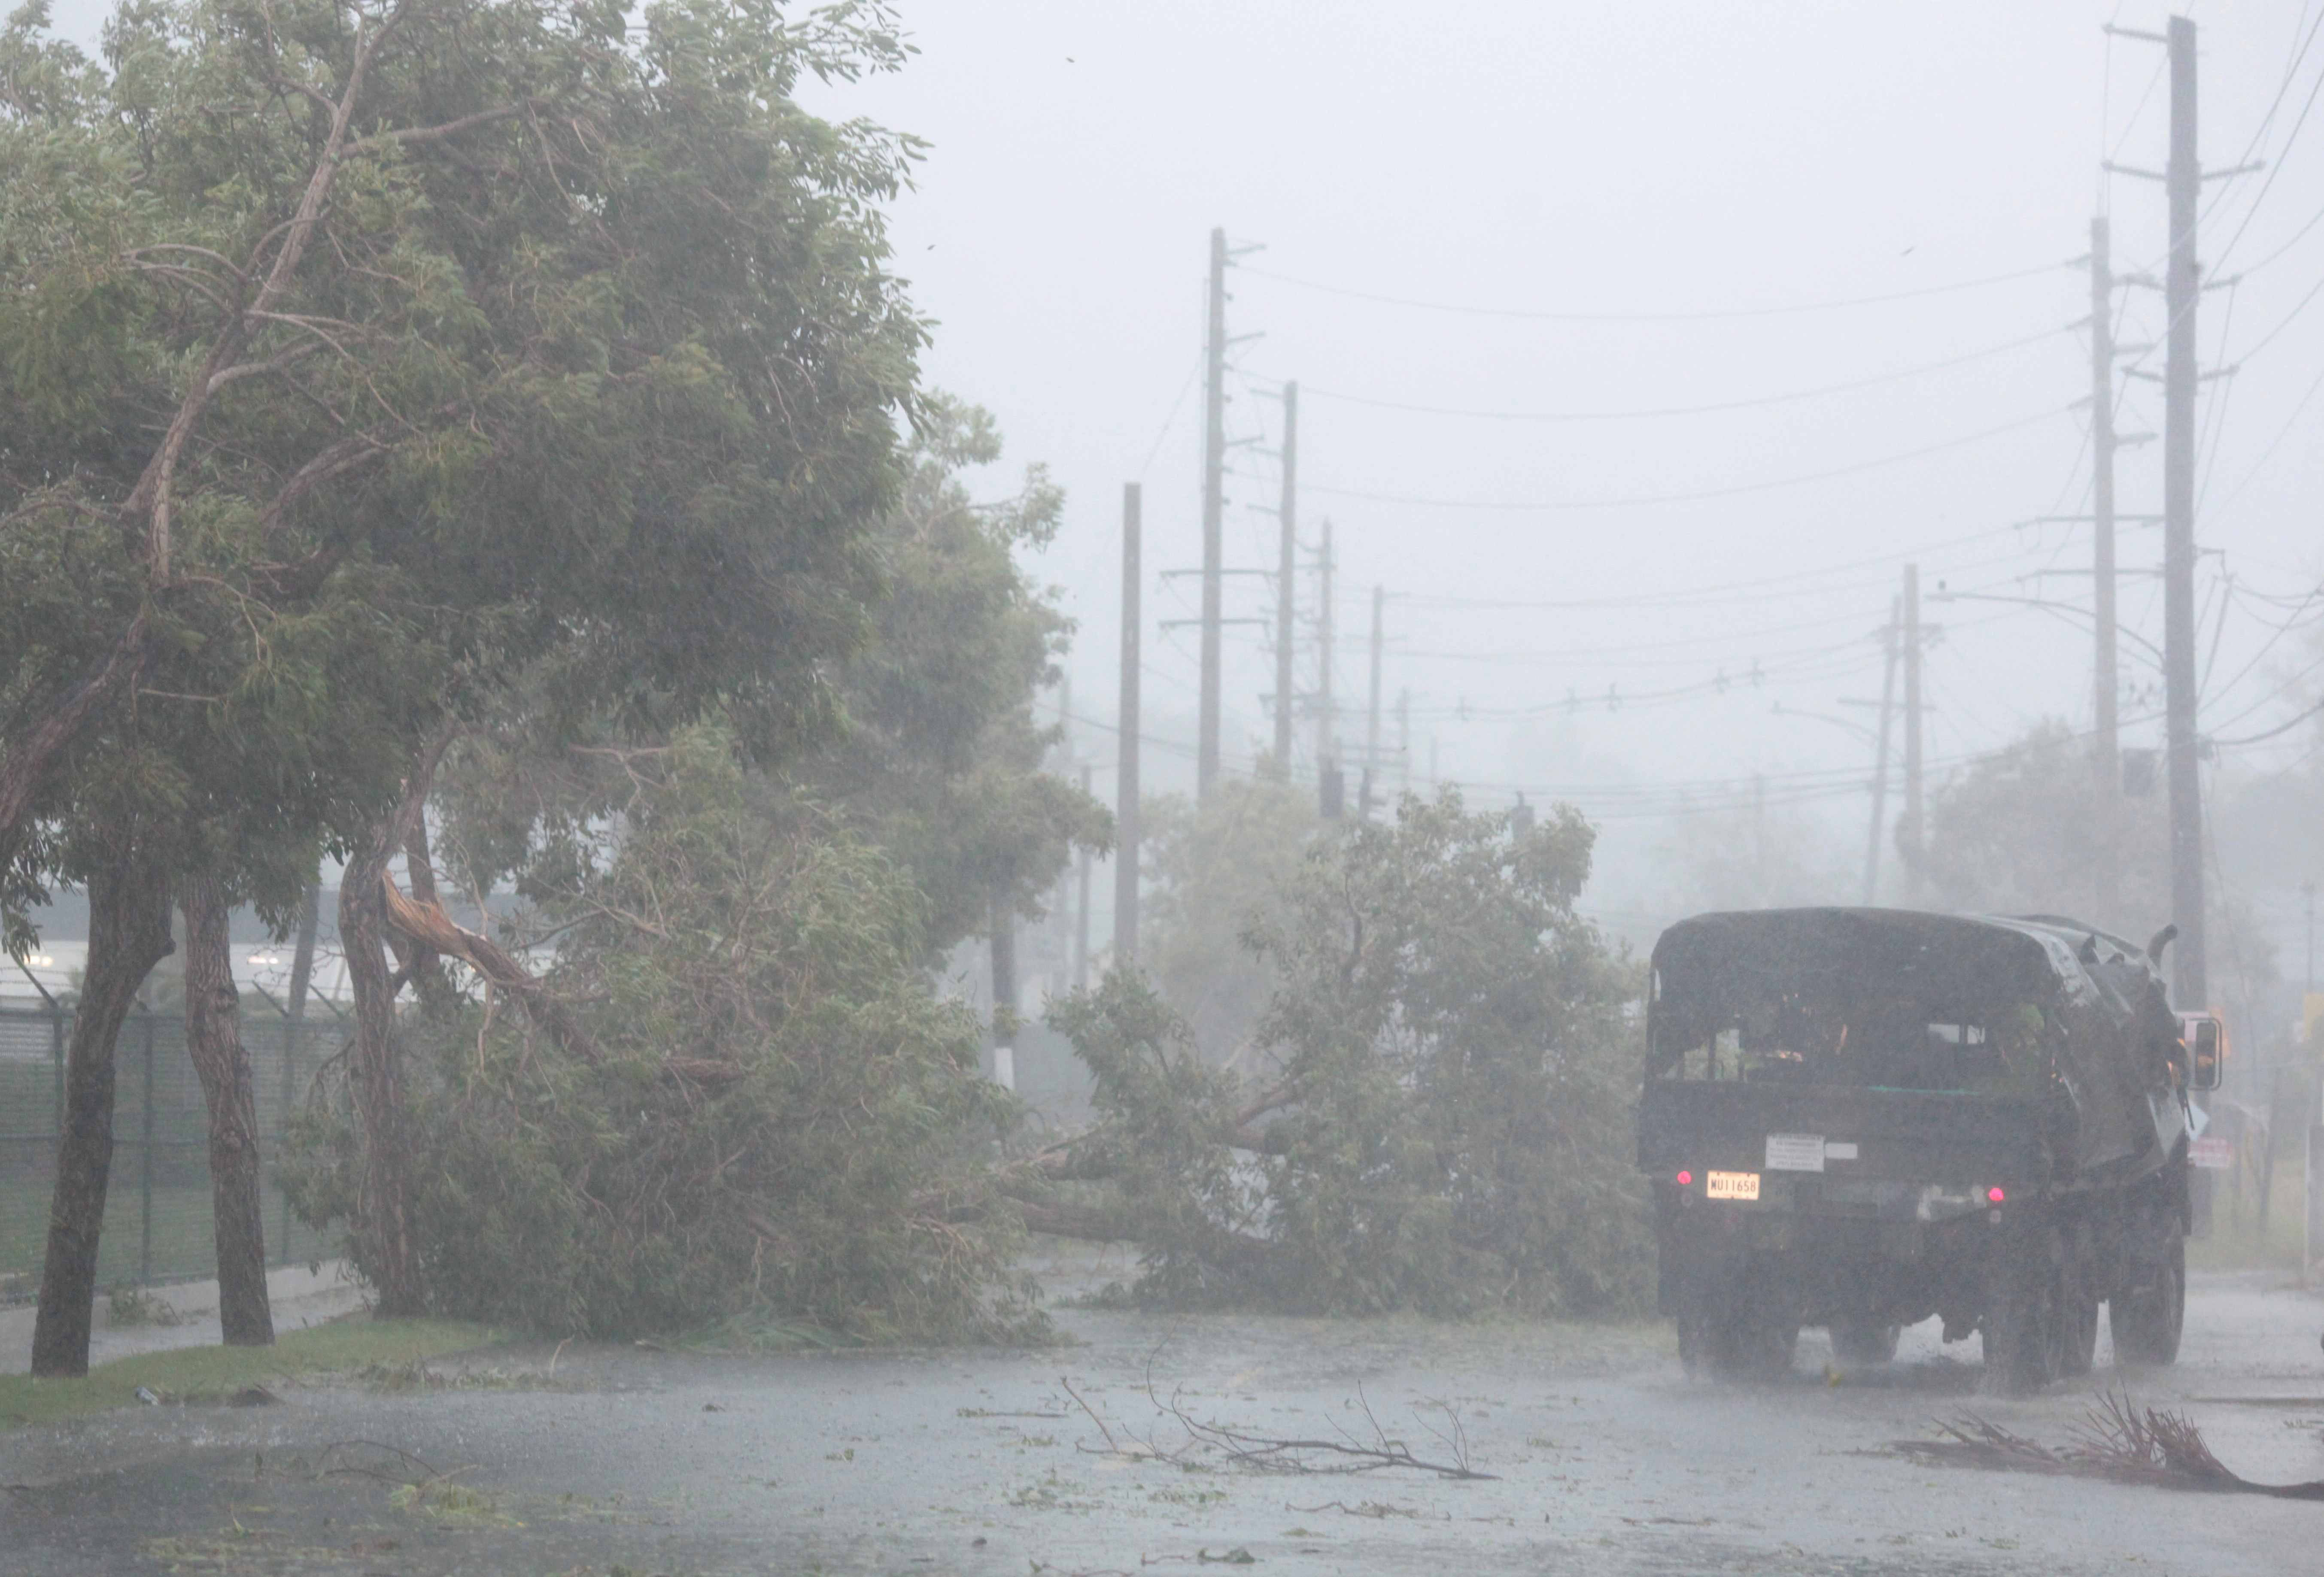 A truck drives past fallen trees as Hurricane Irma howls past Puerto Rico after thrashing several smaller Caribbean islands, in Fajardo, Puerto Rico September 6, 2017.